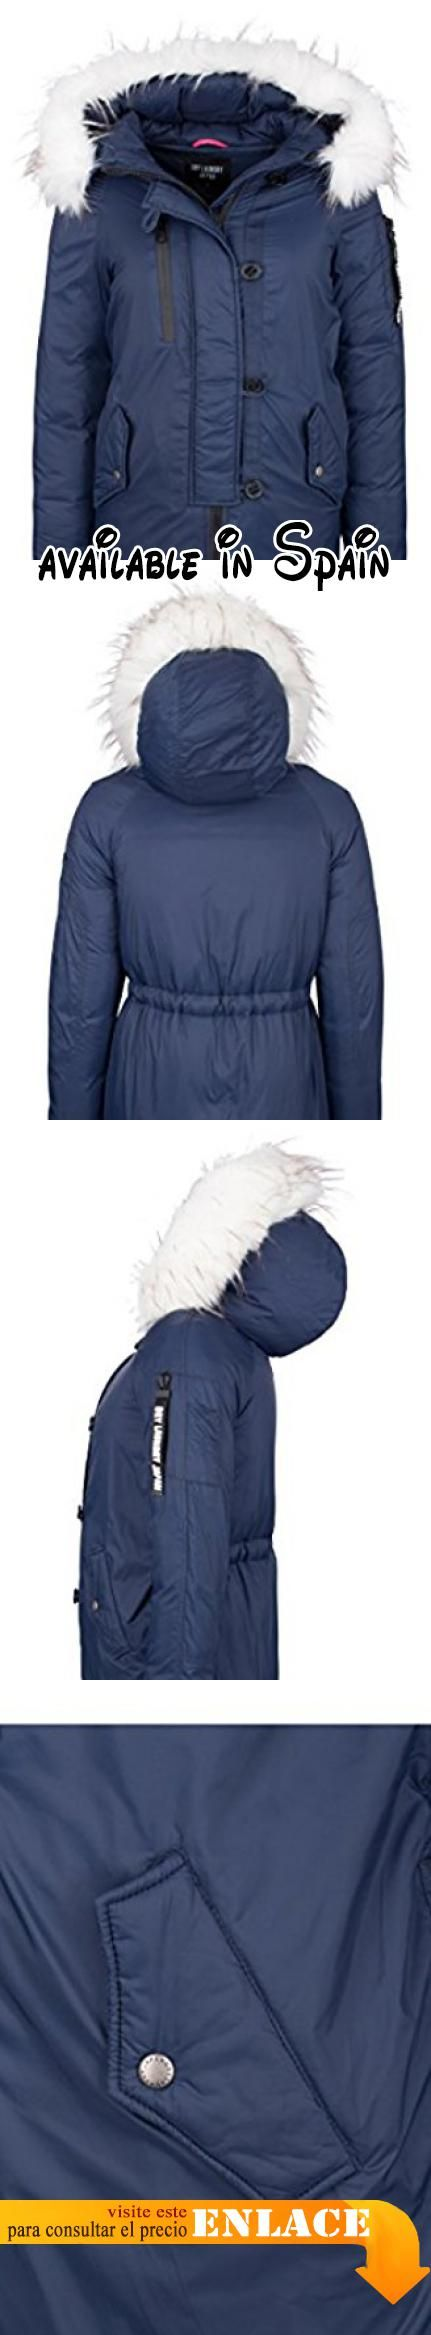 Parka B075nsrpp4 Laundry Azul 90500046 Dry Mujer Xs Wq78cpFR7H